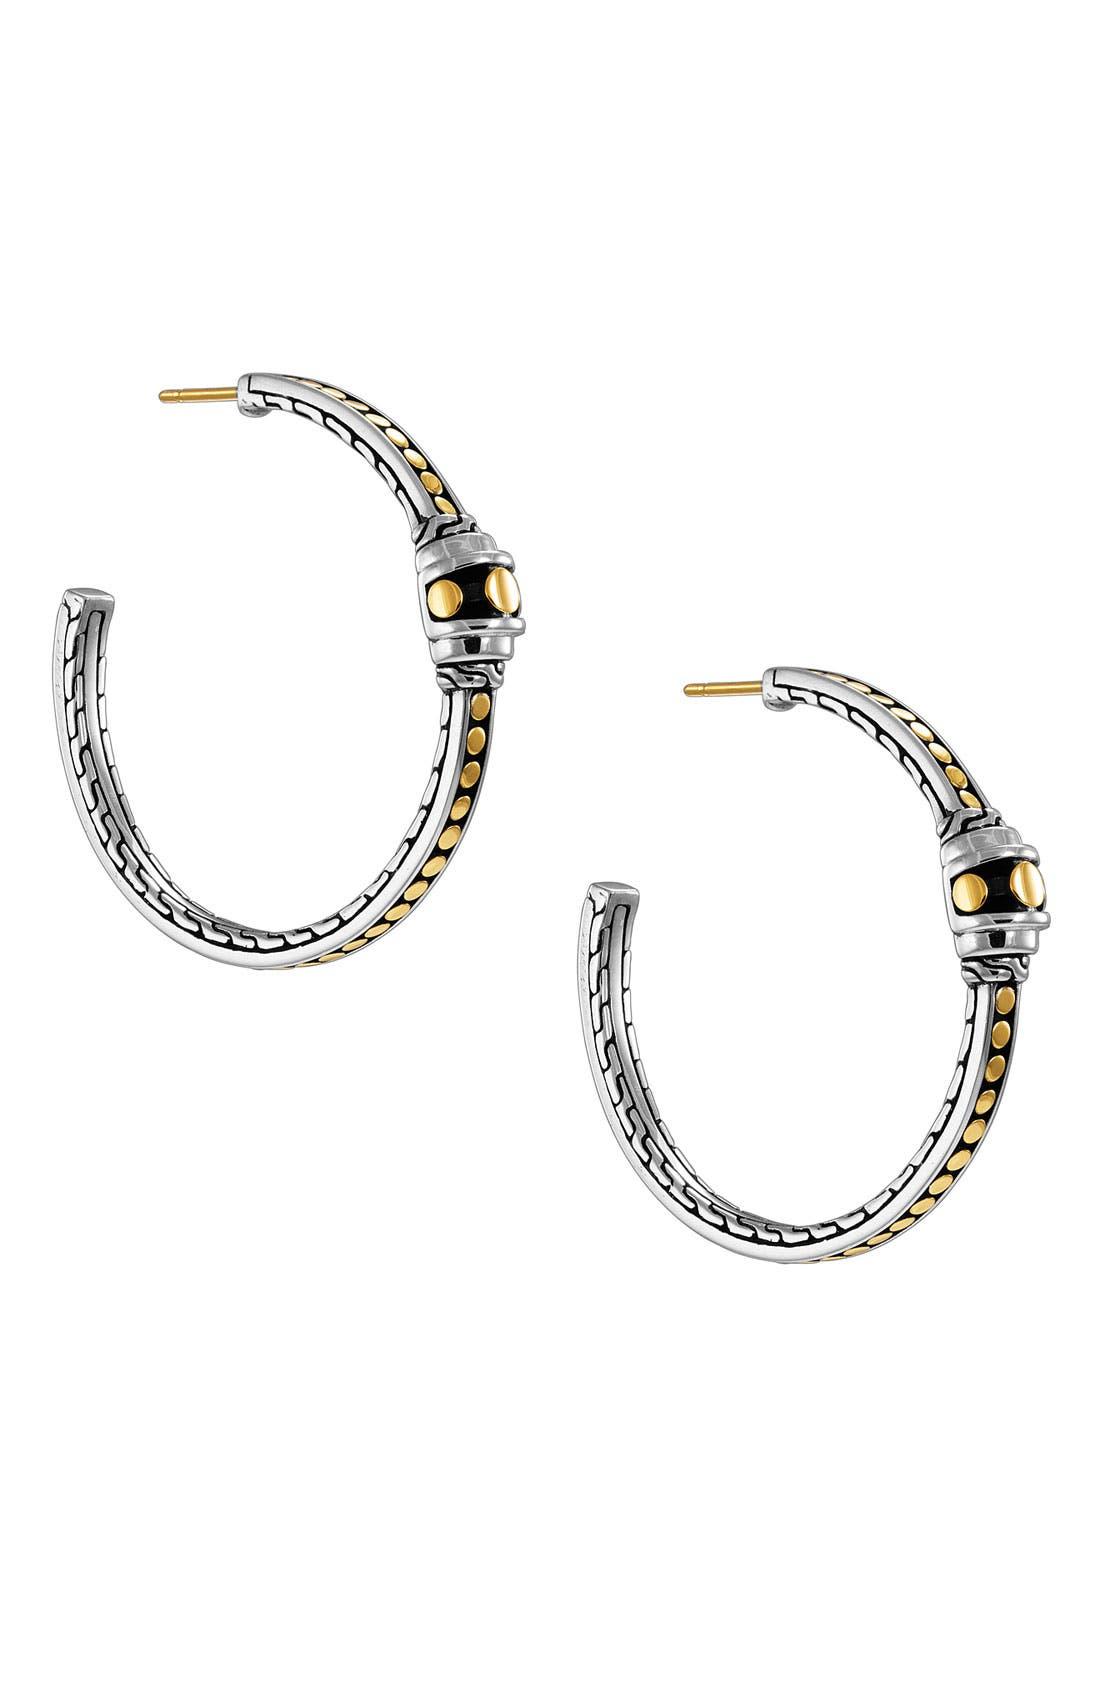 Main Image - John Hardy 'Dot Gold & Silver' Station Hoop Earrings